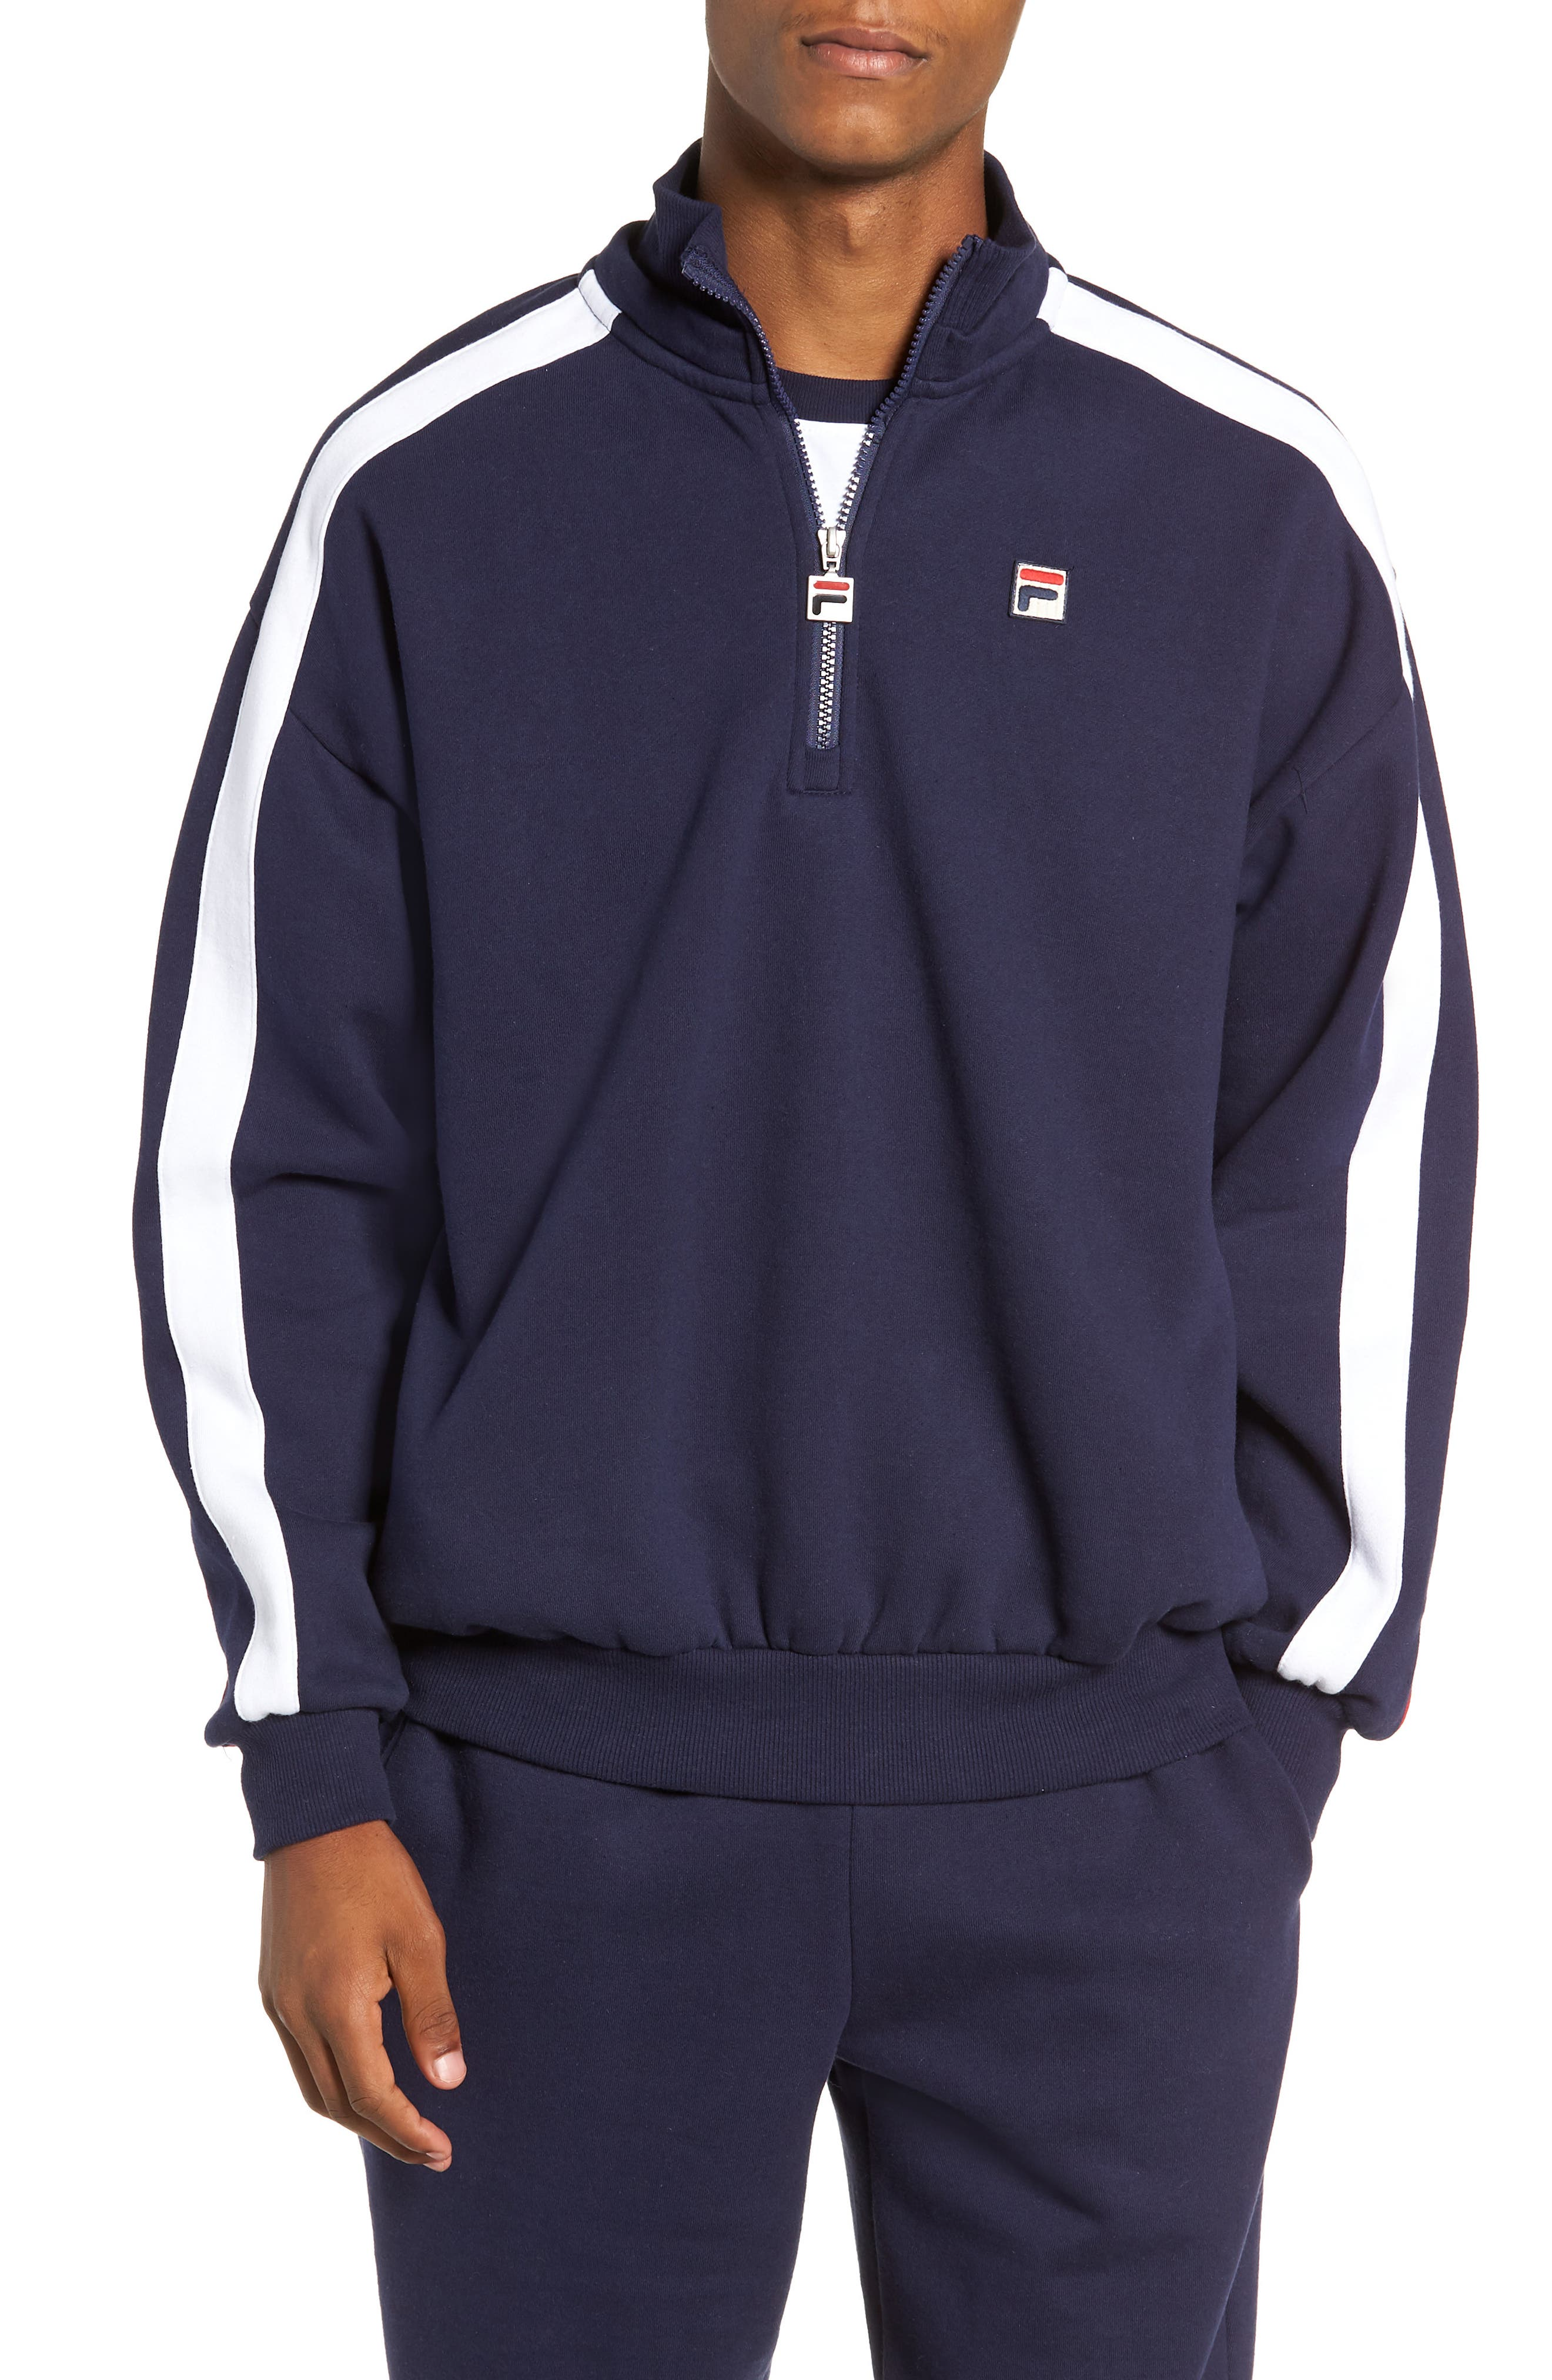 Quarter Zip Sweatshirt,                             Main thumbnail 1, color,                             PEACOAT/ WHITE/ CHINESE RED